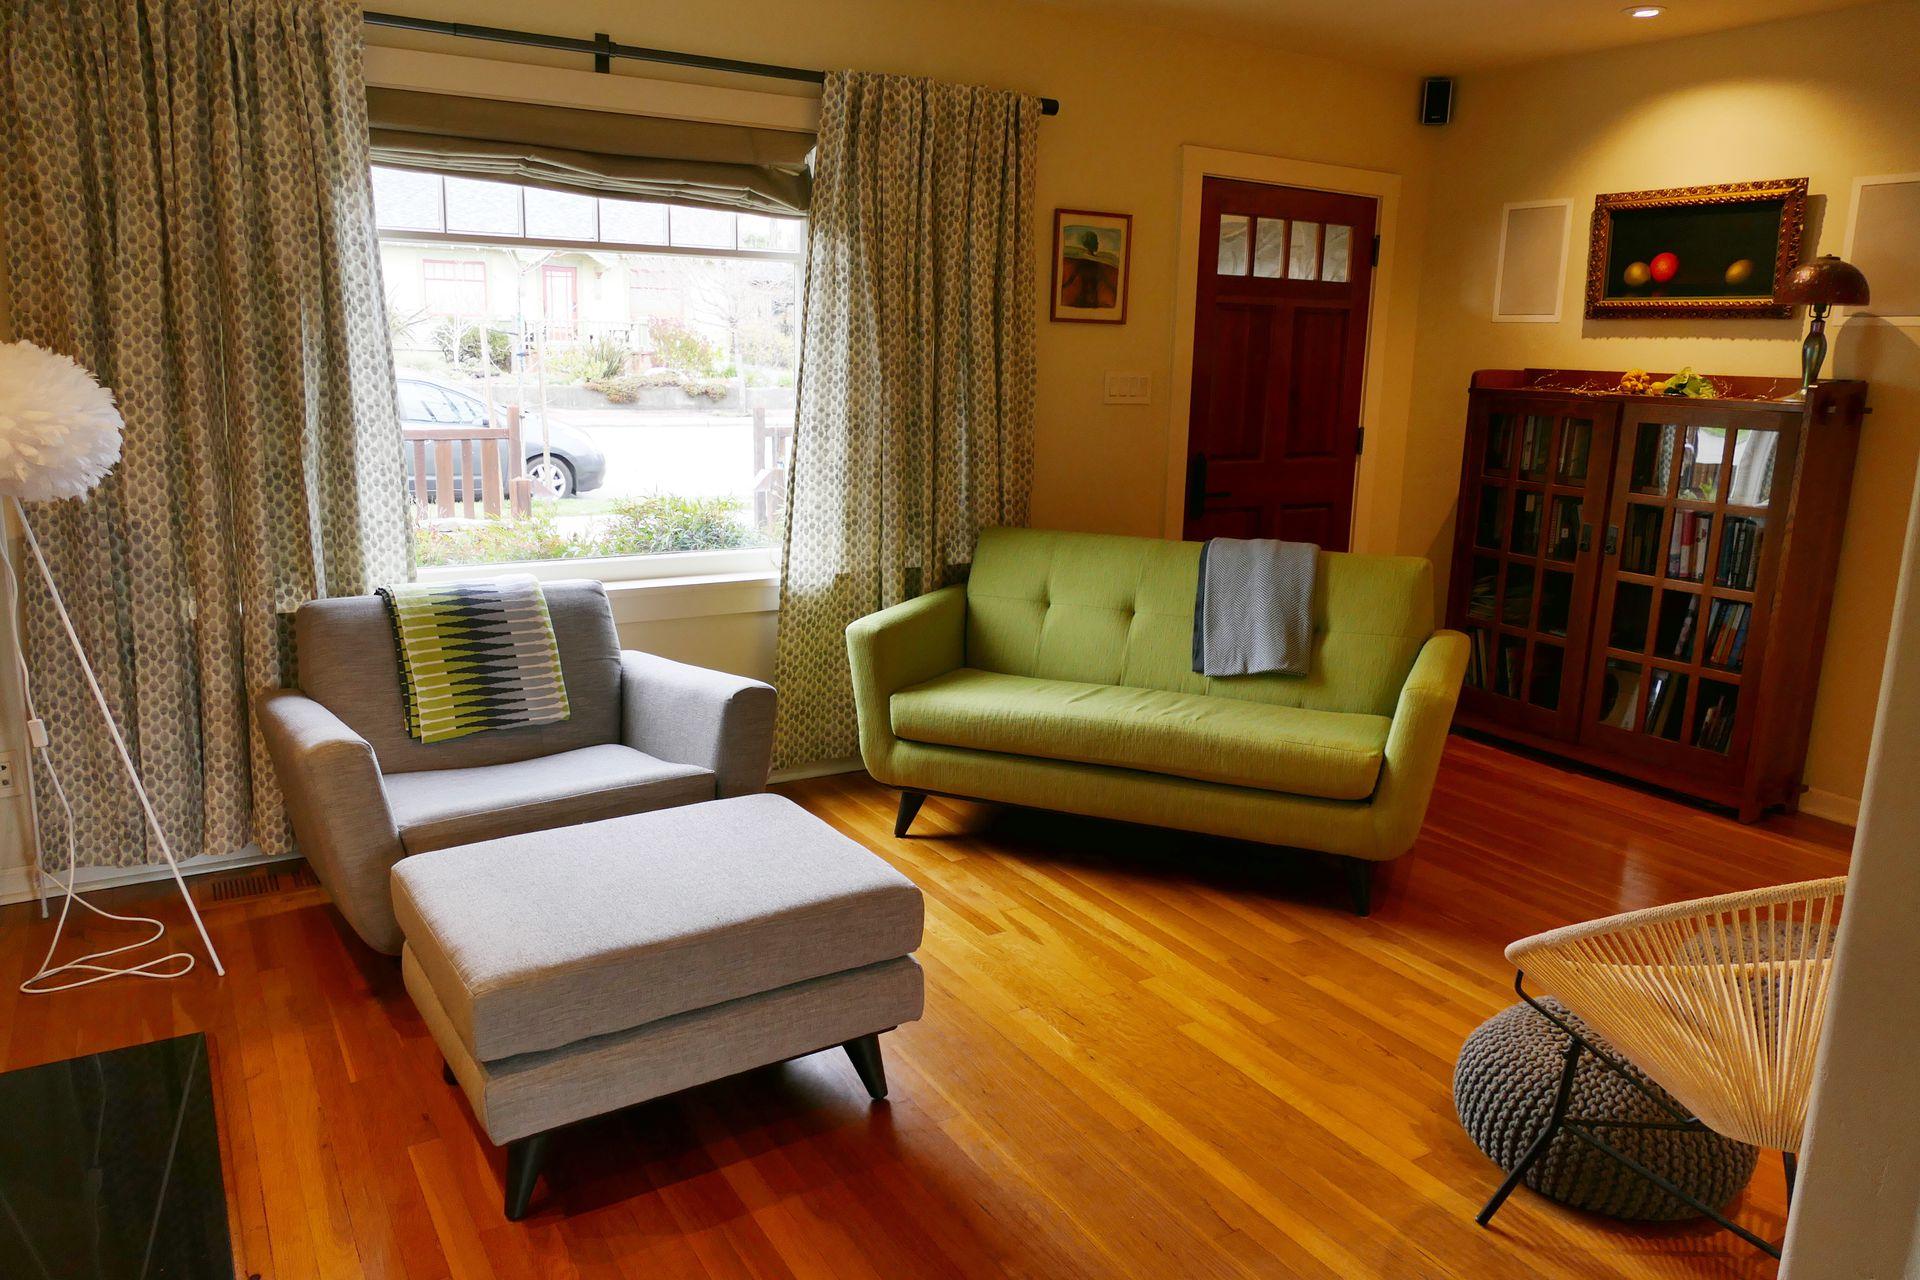 2 bd plus loft, 2-bath w/master suite, hot tub, 5 mins from beach ...